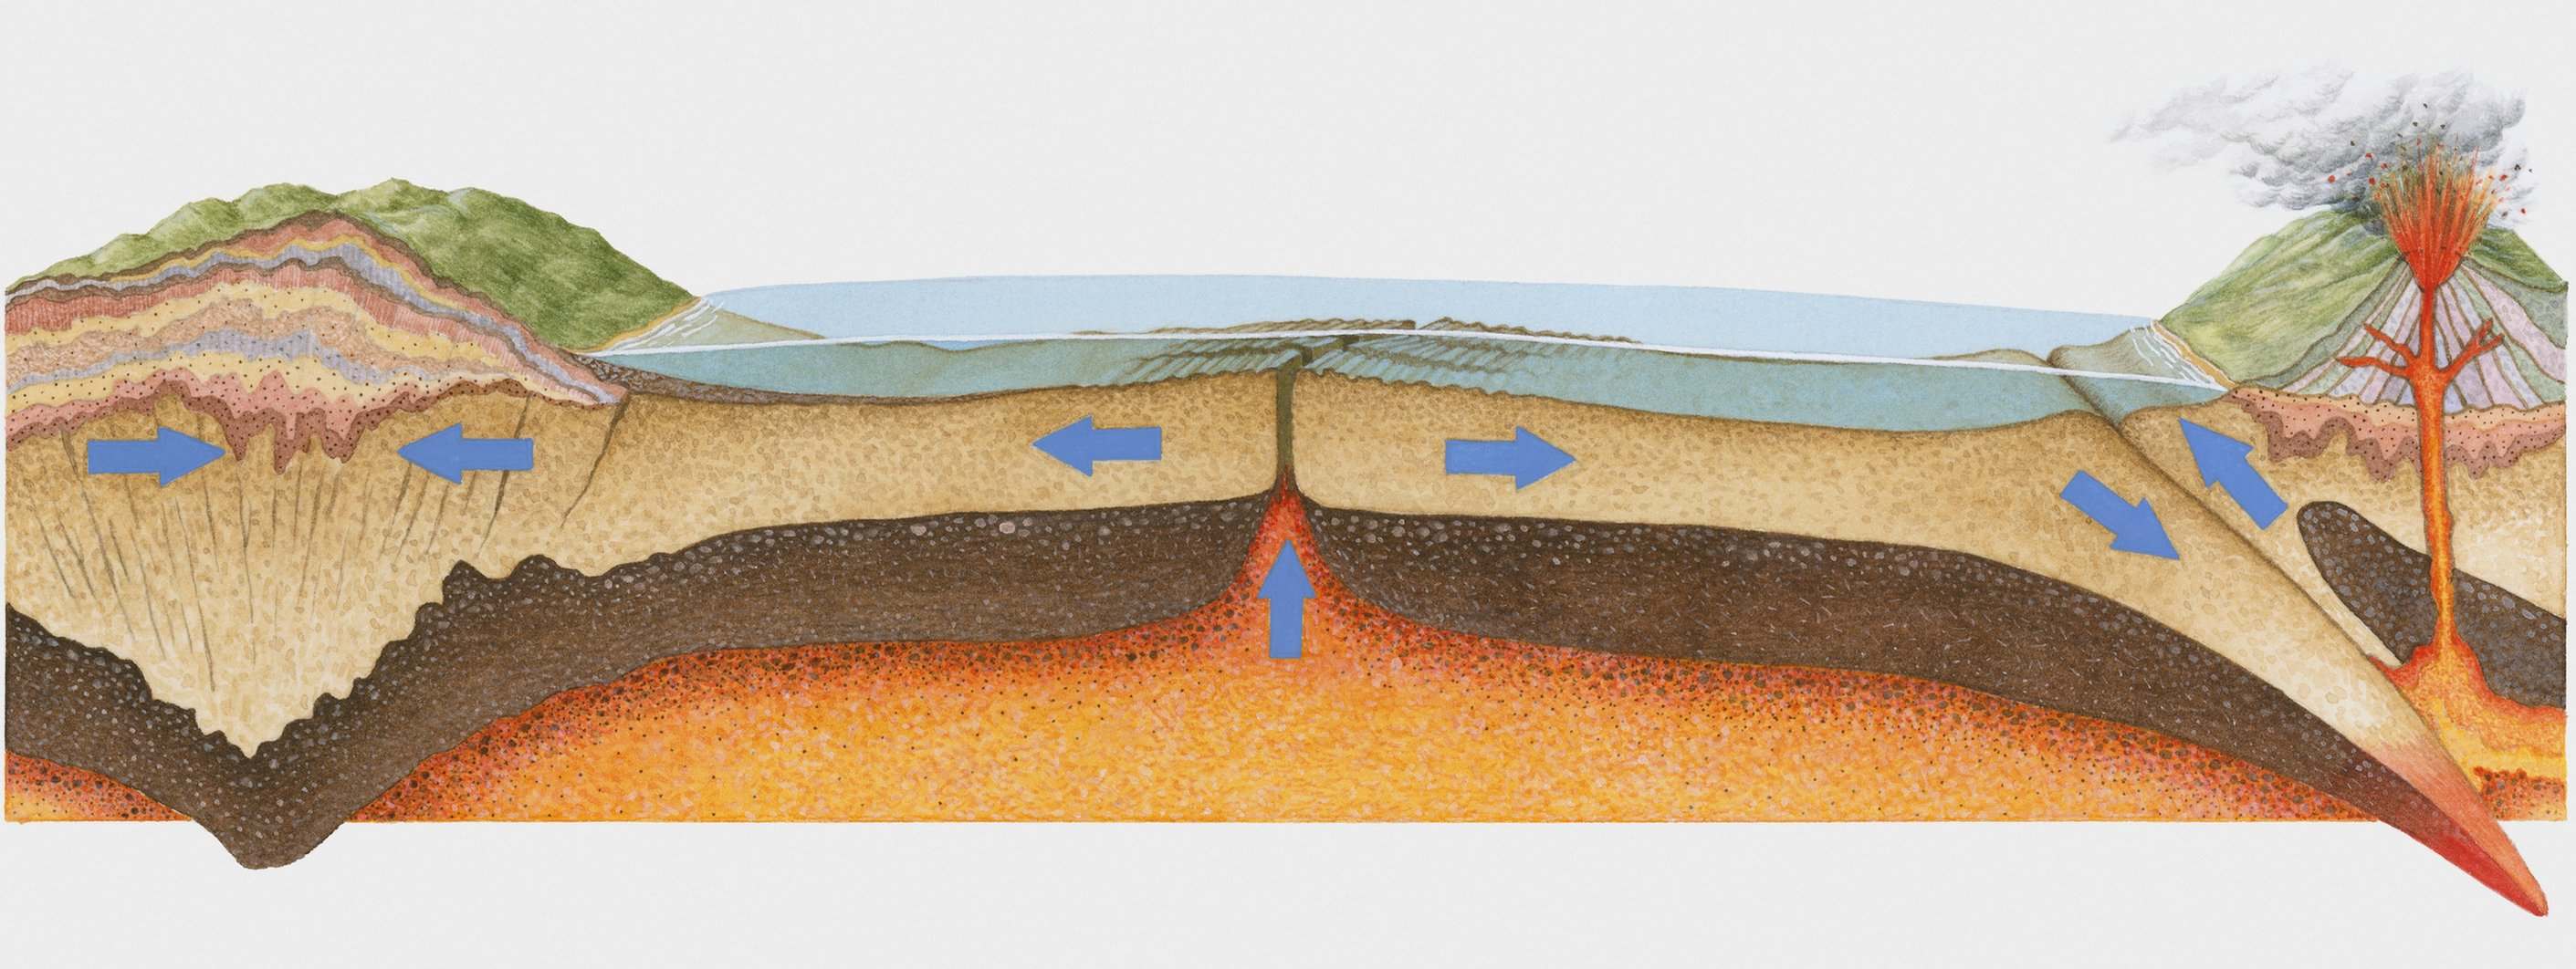 An illustration of plate tectonics